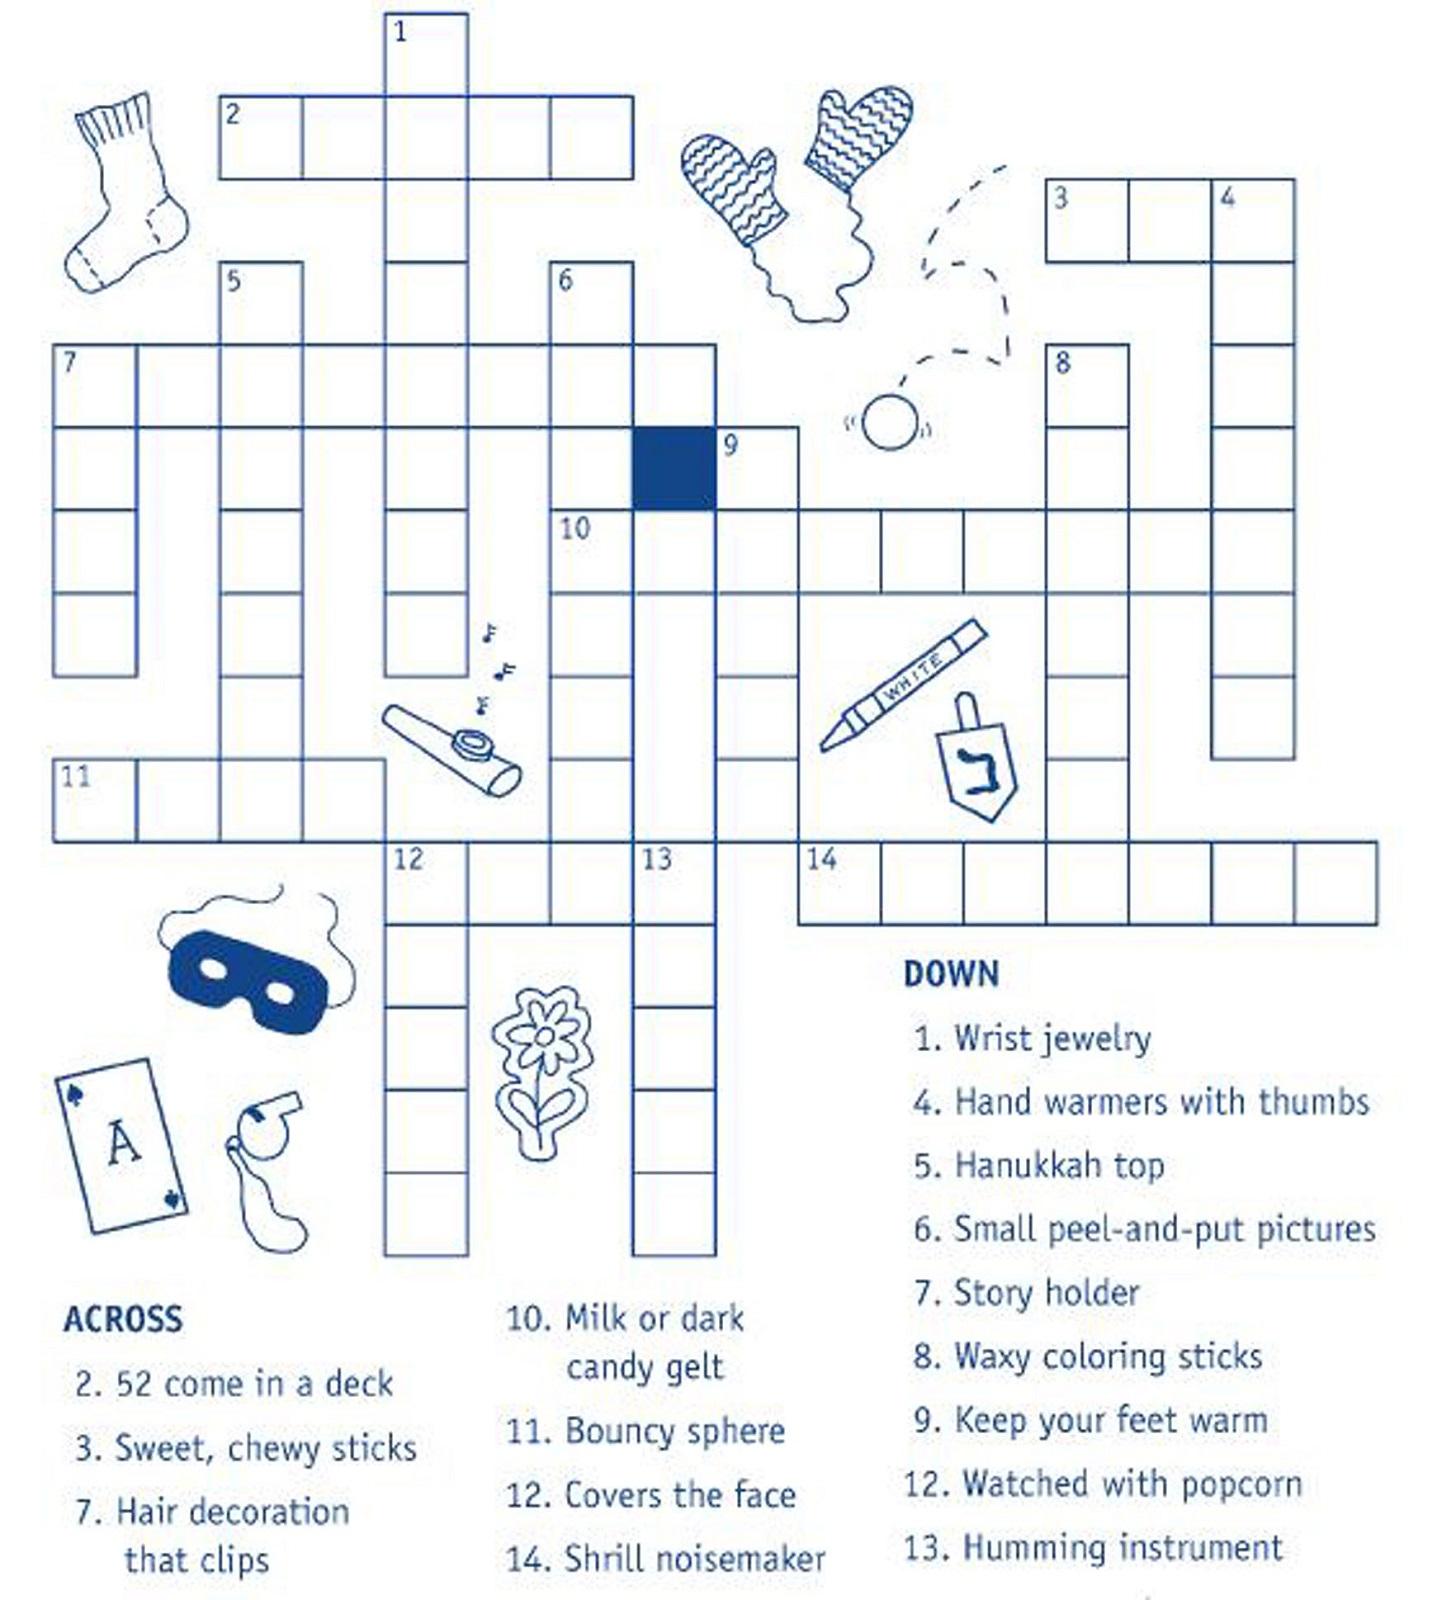 Kids' Crossword Puzzles To Print | Activity Shelter - Printable Hanukkah Crossword Puzzles